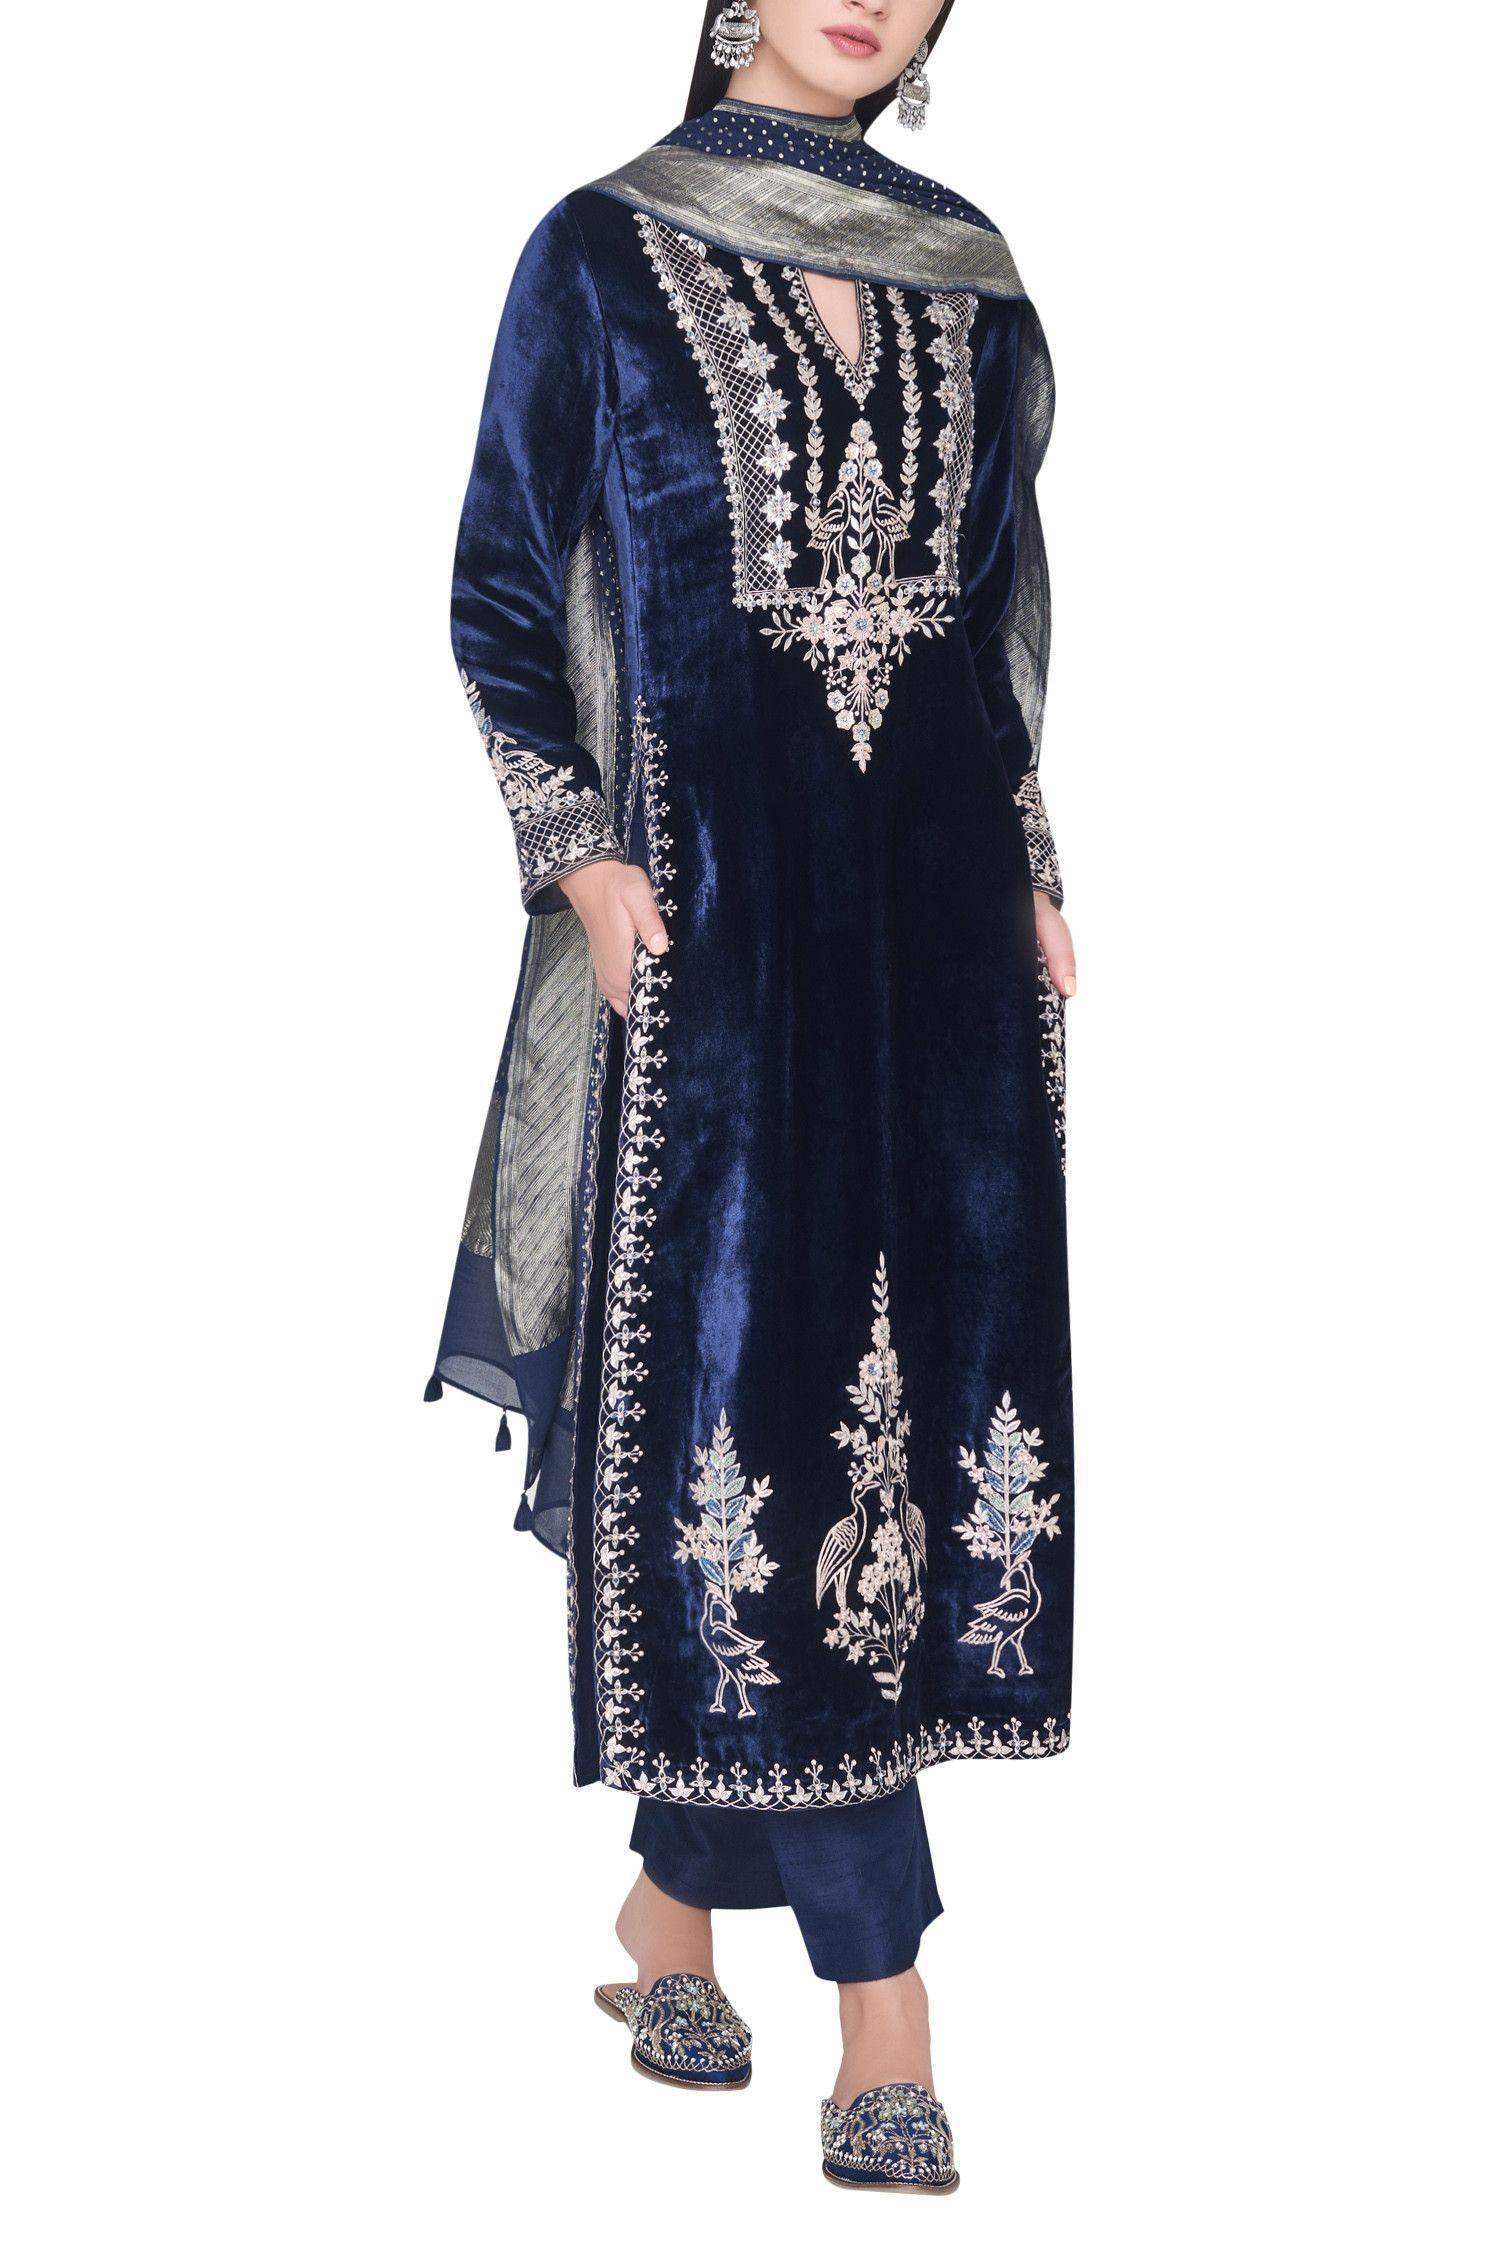 Buy Gota Patti Embroidered Kurta Set By Anita Dongre At Aza Fashions Velvet Dress Designs Indian Designer Outfits Dresses Formal Elegant